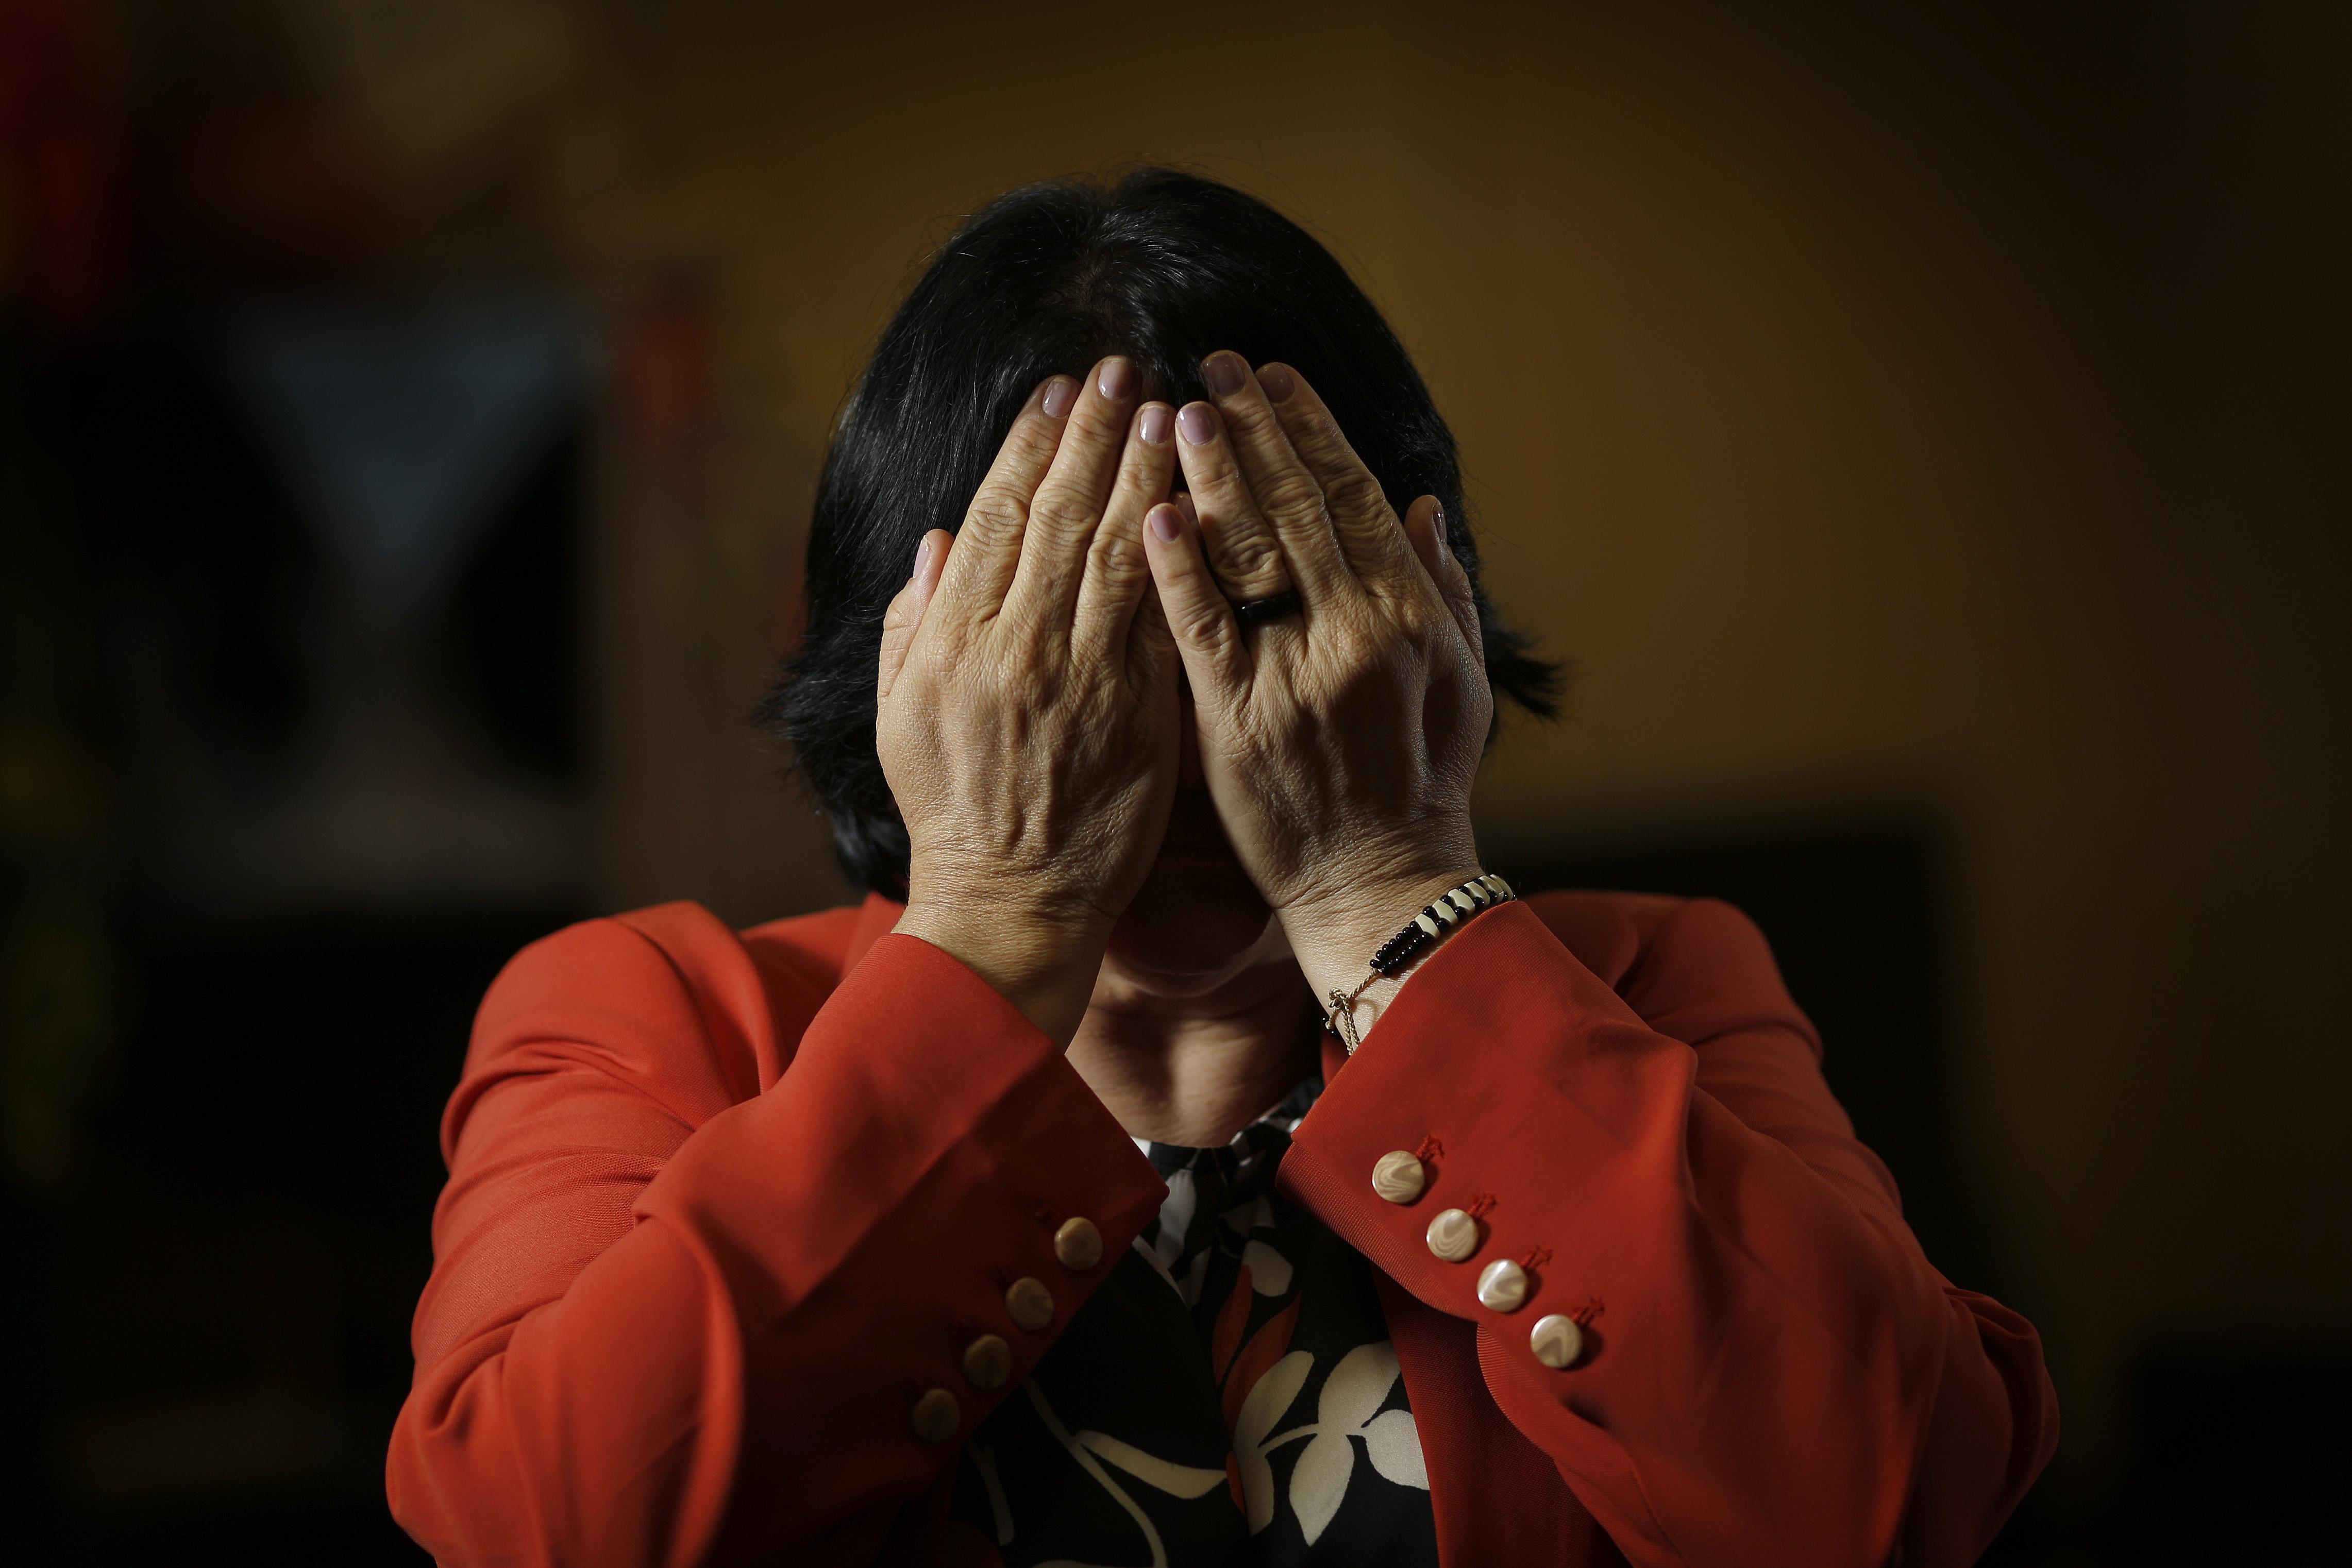 IMAGEM: Bolsonarista que agrediu enfermeiros é terceirizado da pasta de Damares